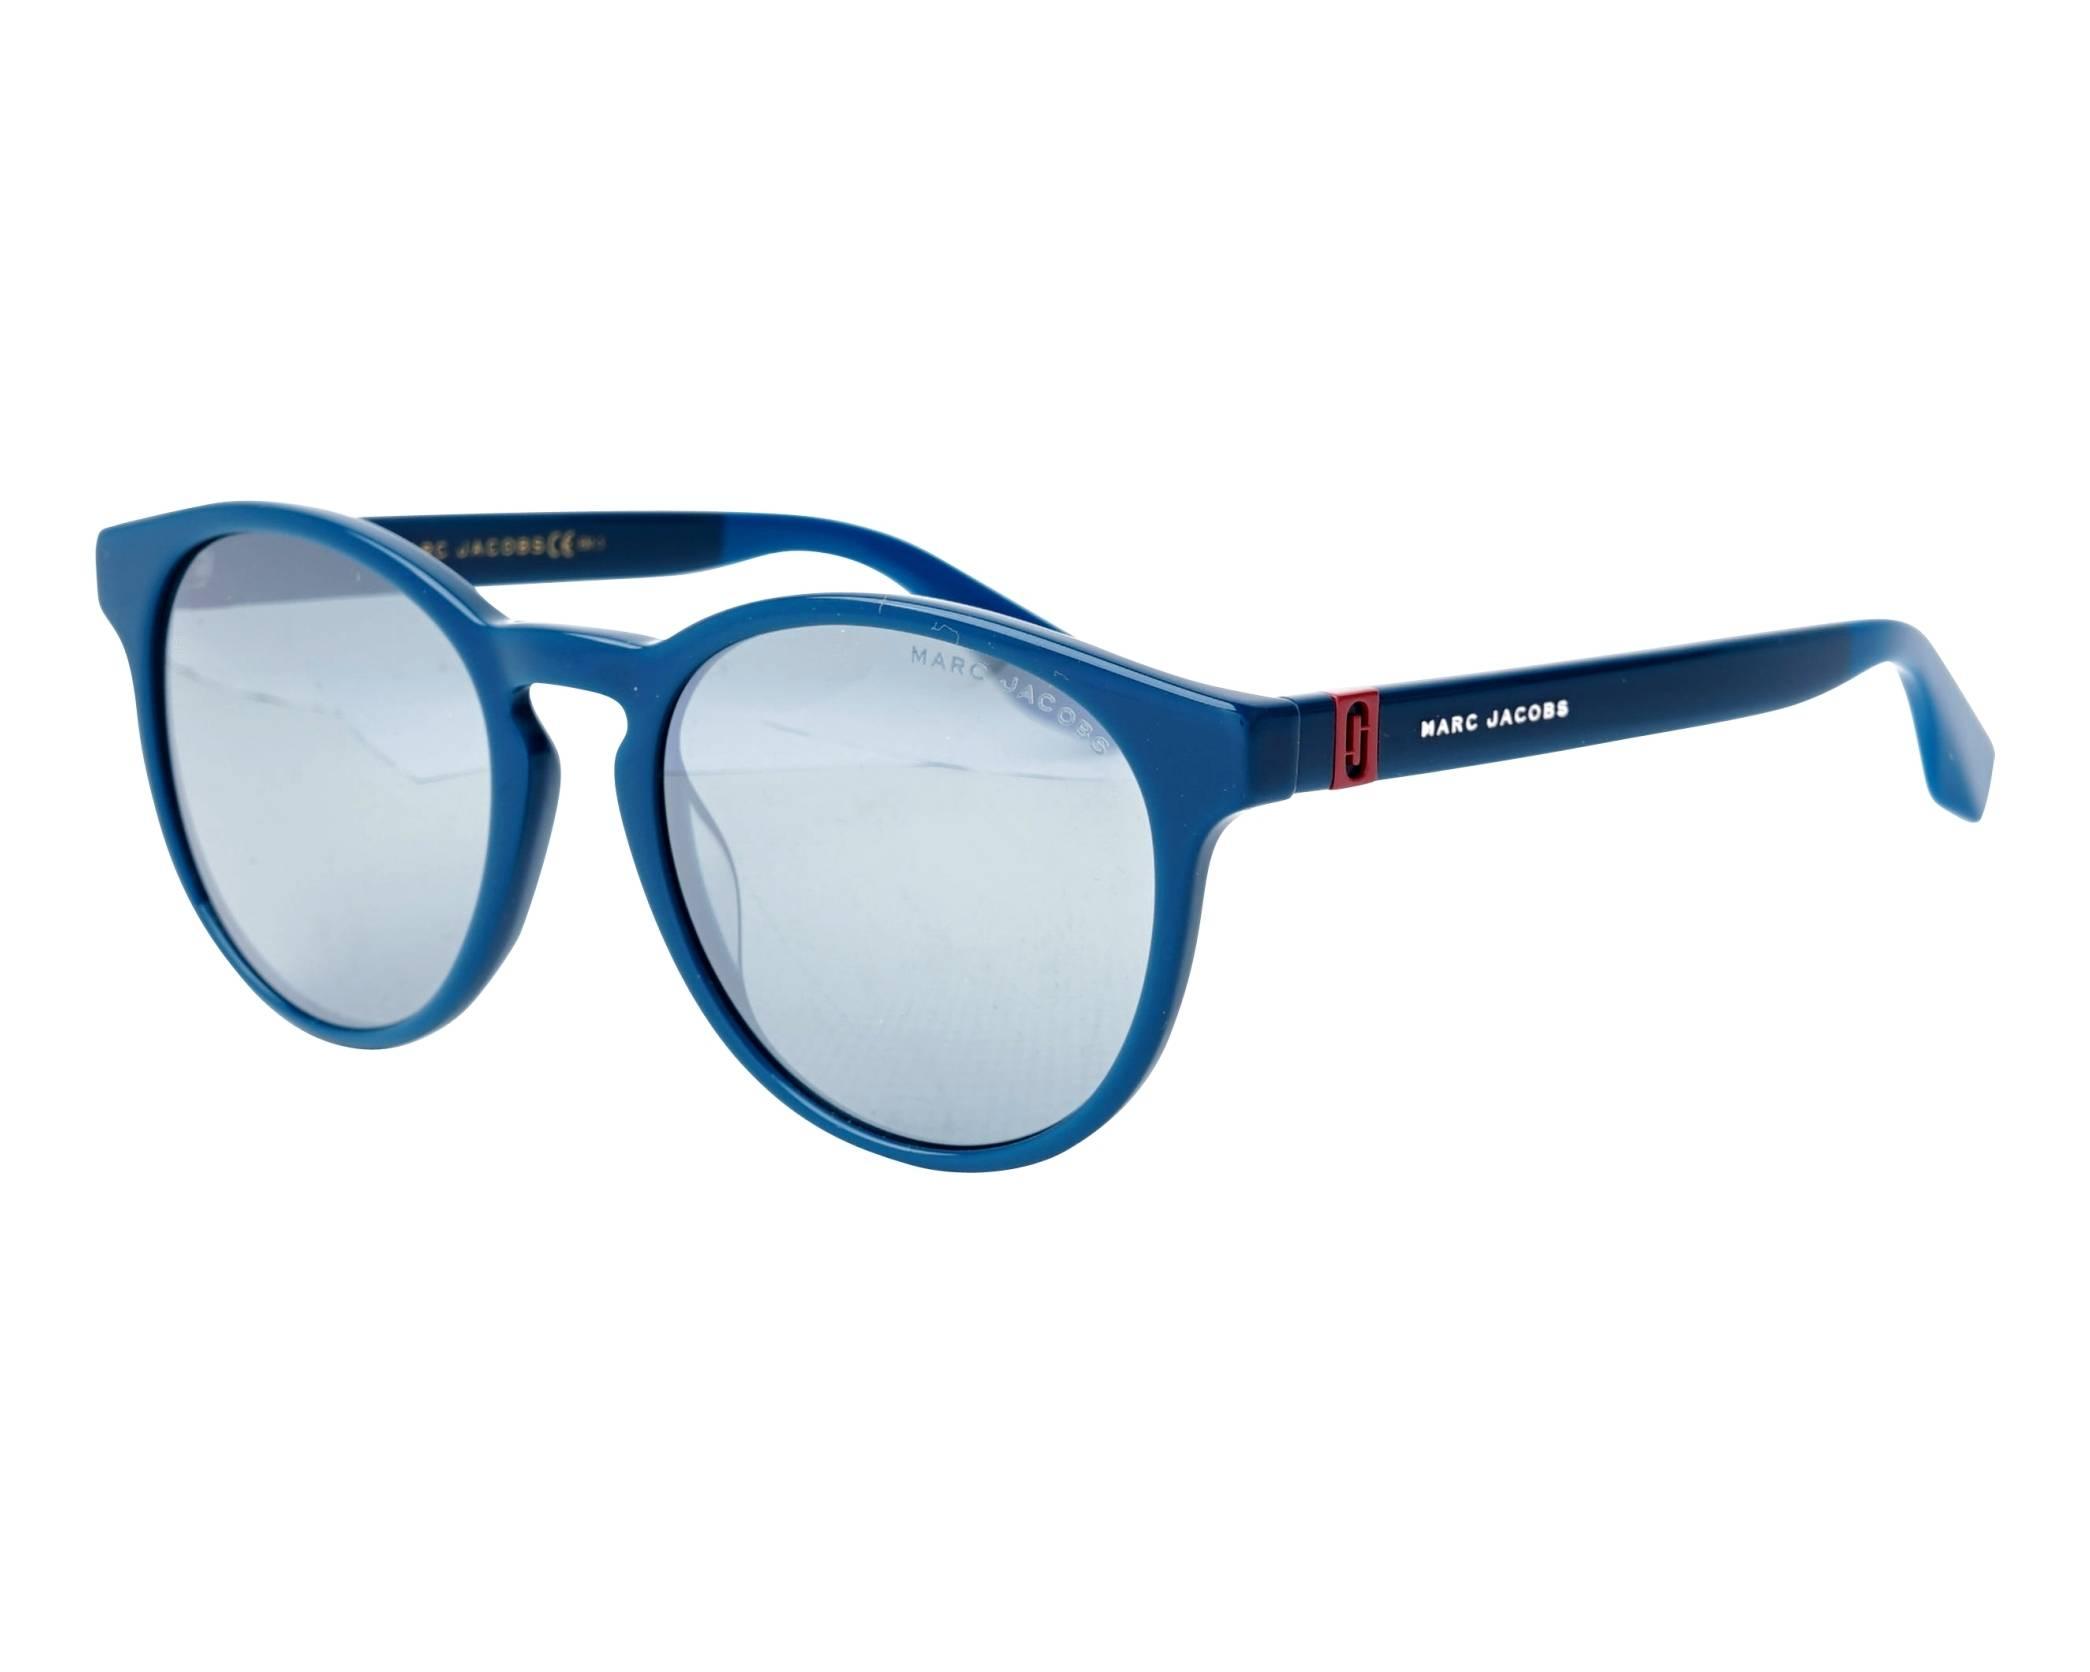 5e658ef7832 Sunglasses Marc Jacobs MARC-351-S ZI9T4 52-19 Green profile view